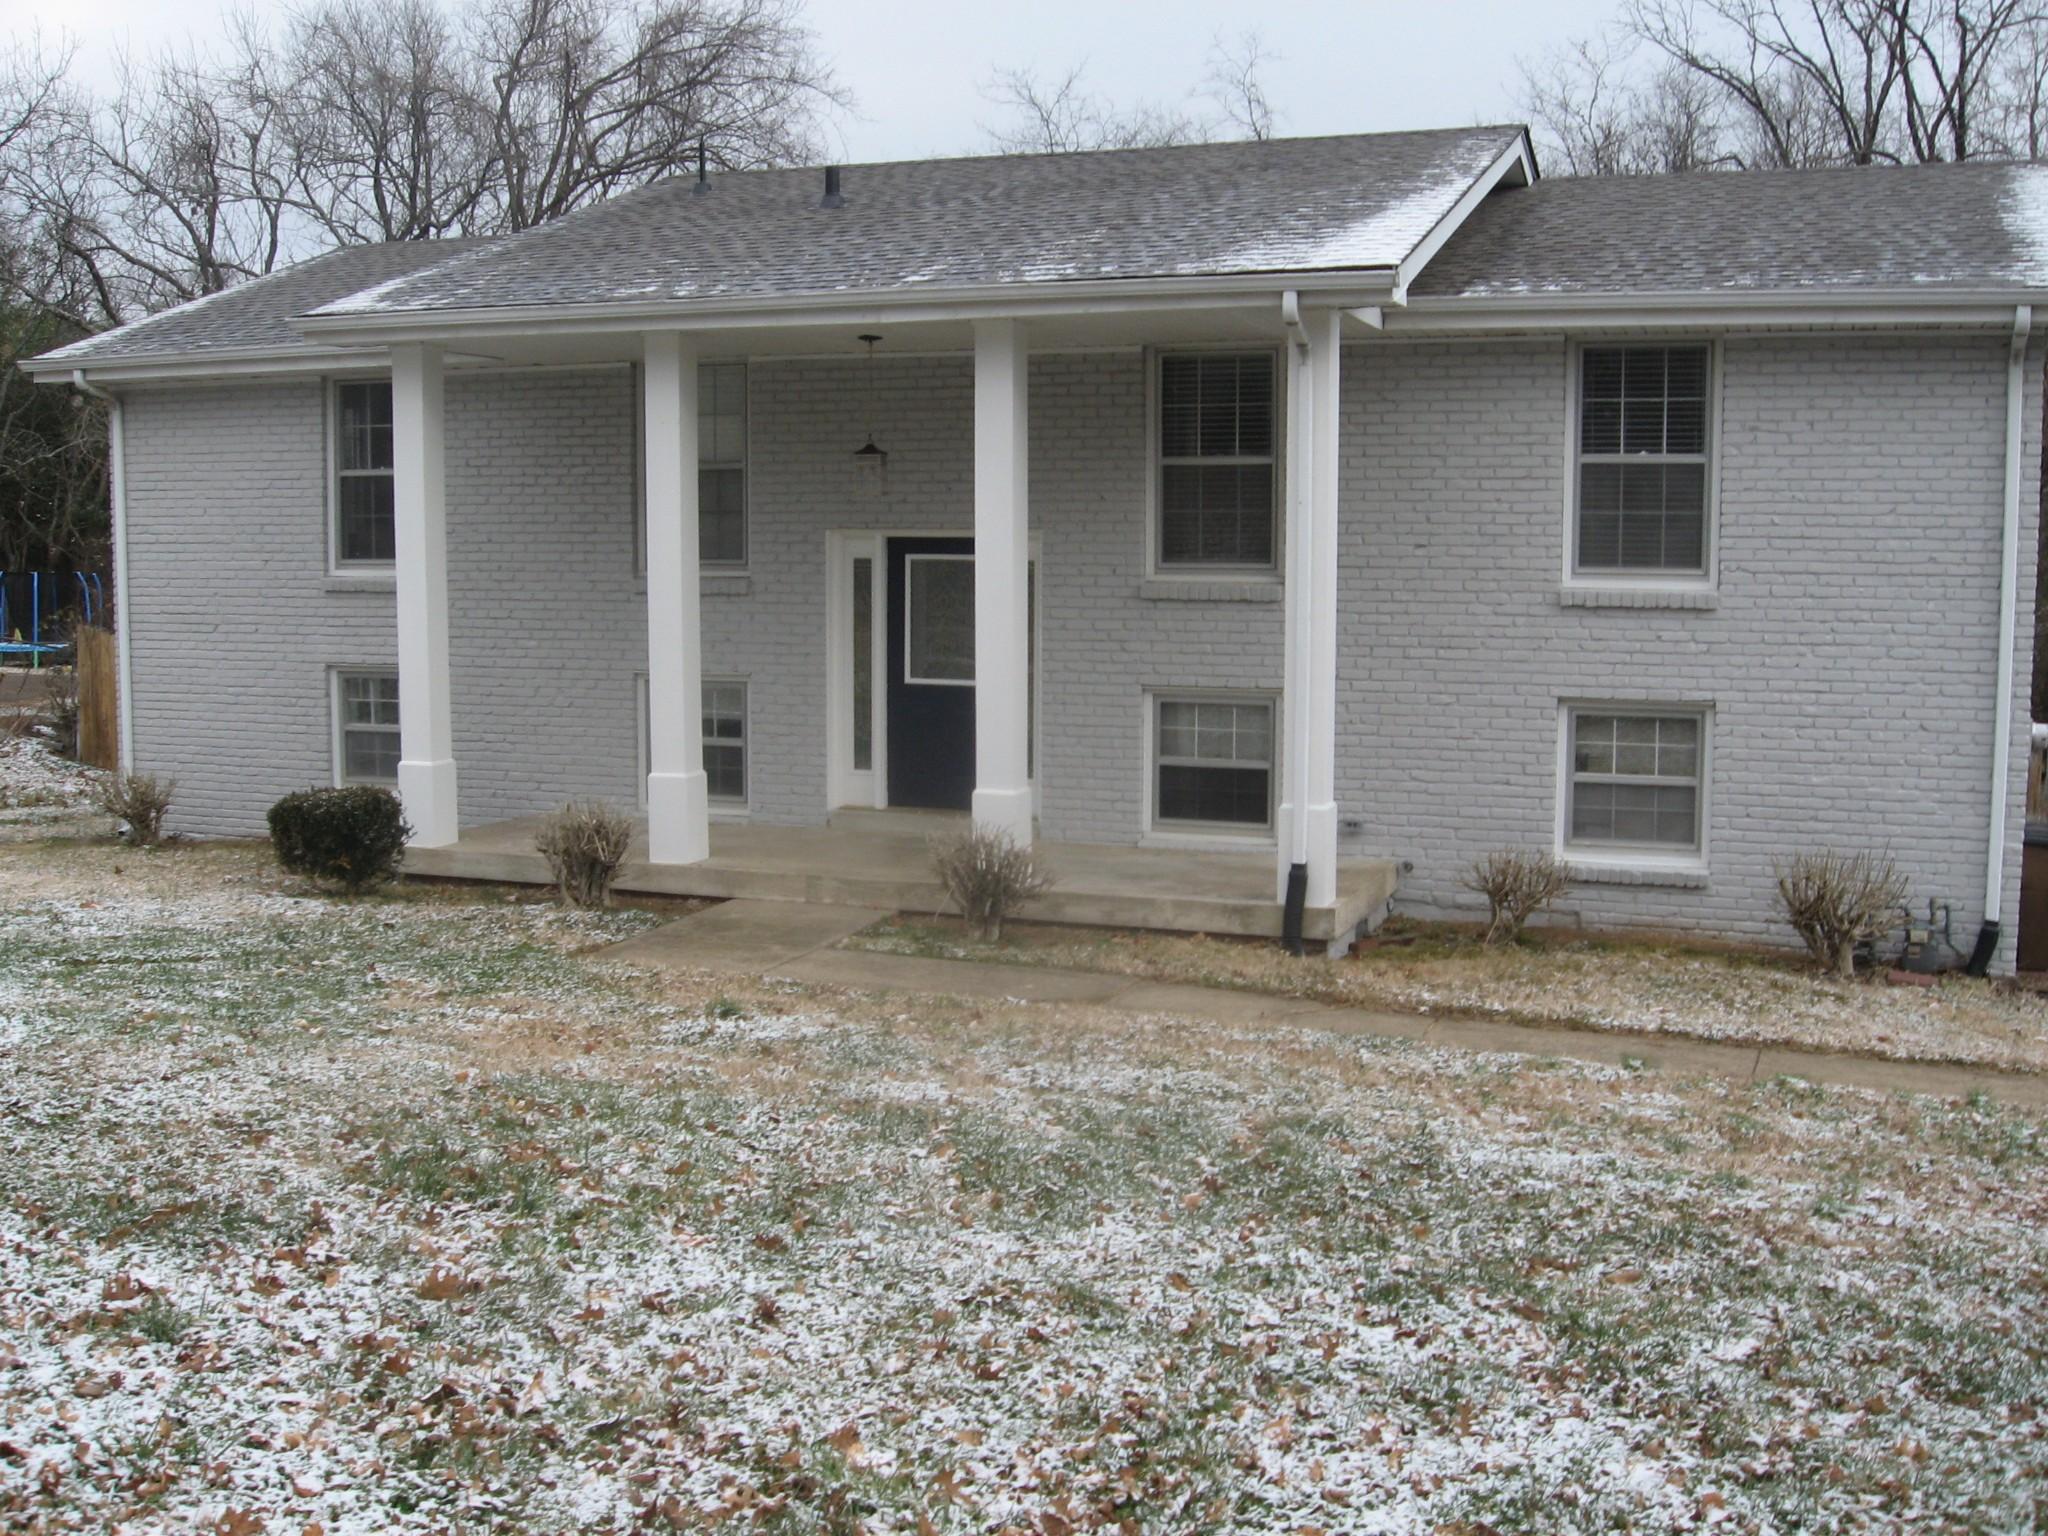 2716 Mossdale Dr Property Photo - Nashville, TN real estate listing